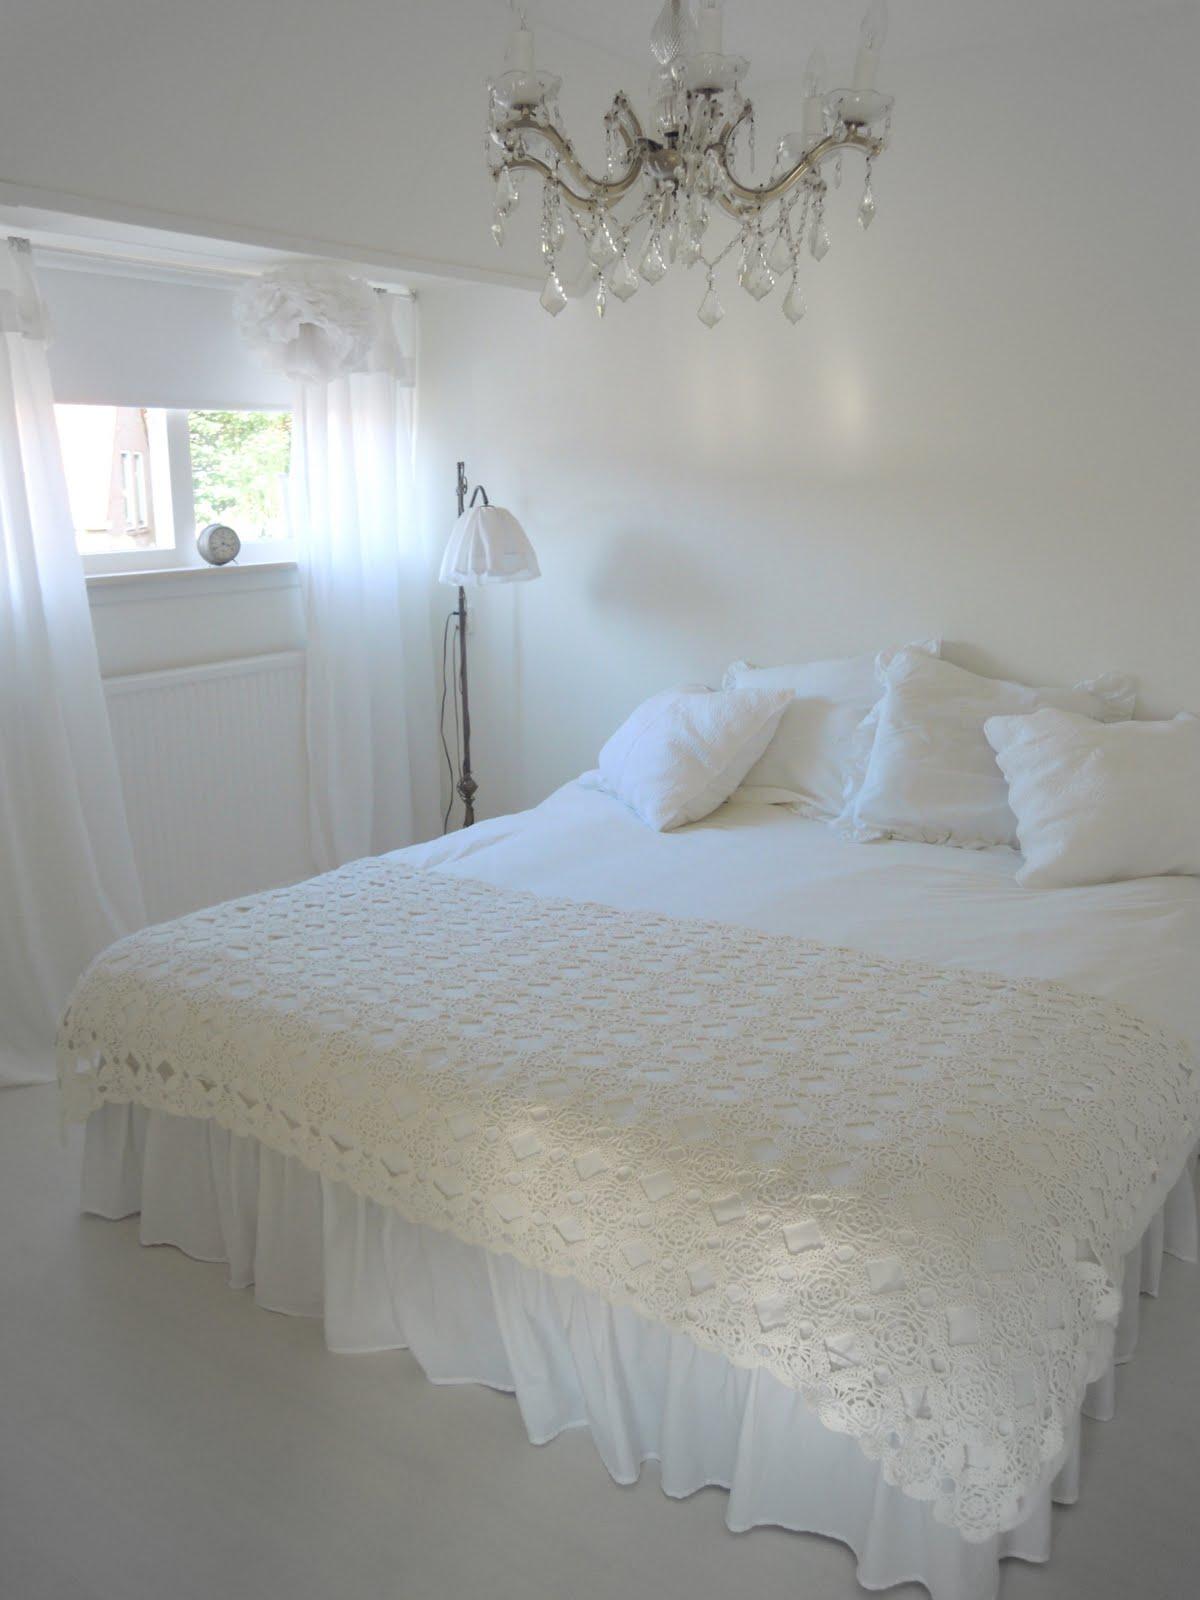 nl.funvit  meiden slaapkamer idee, Meubels Ideeën